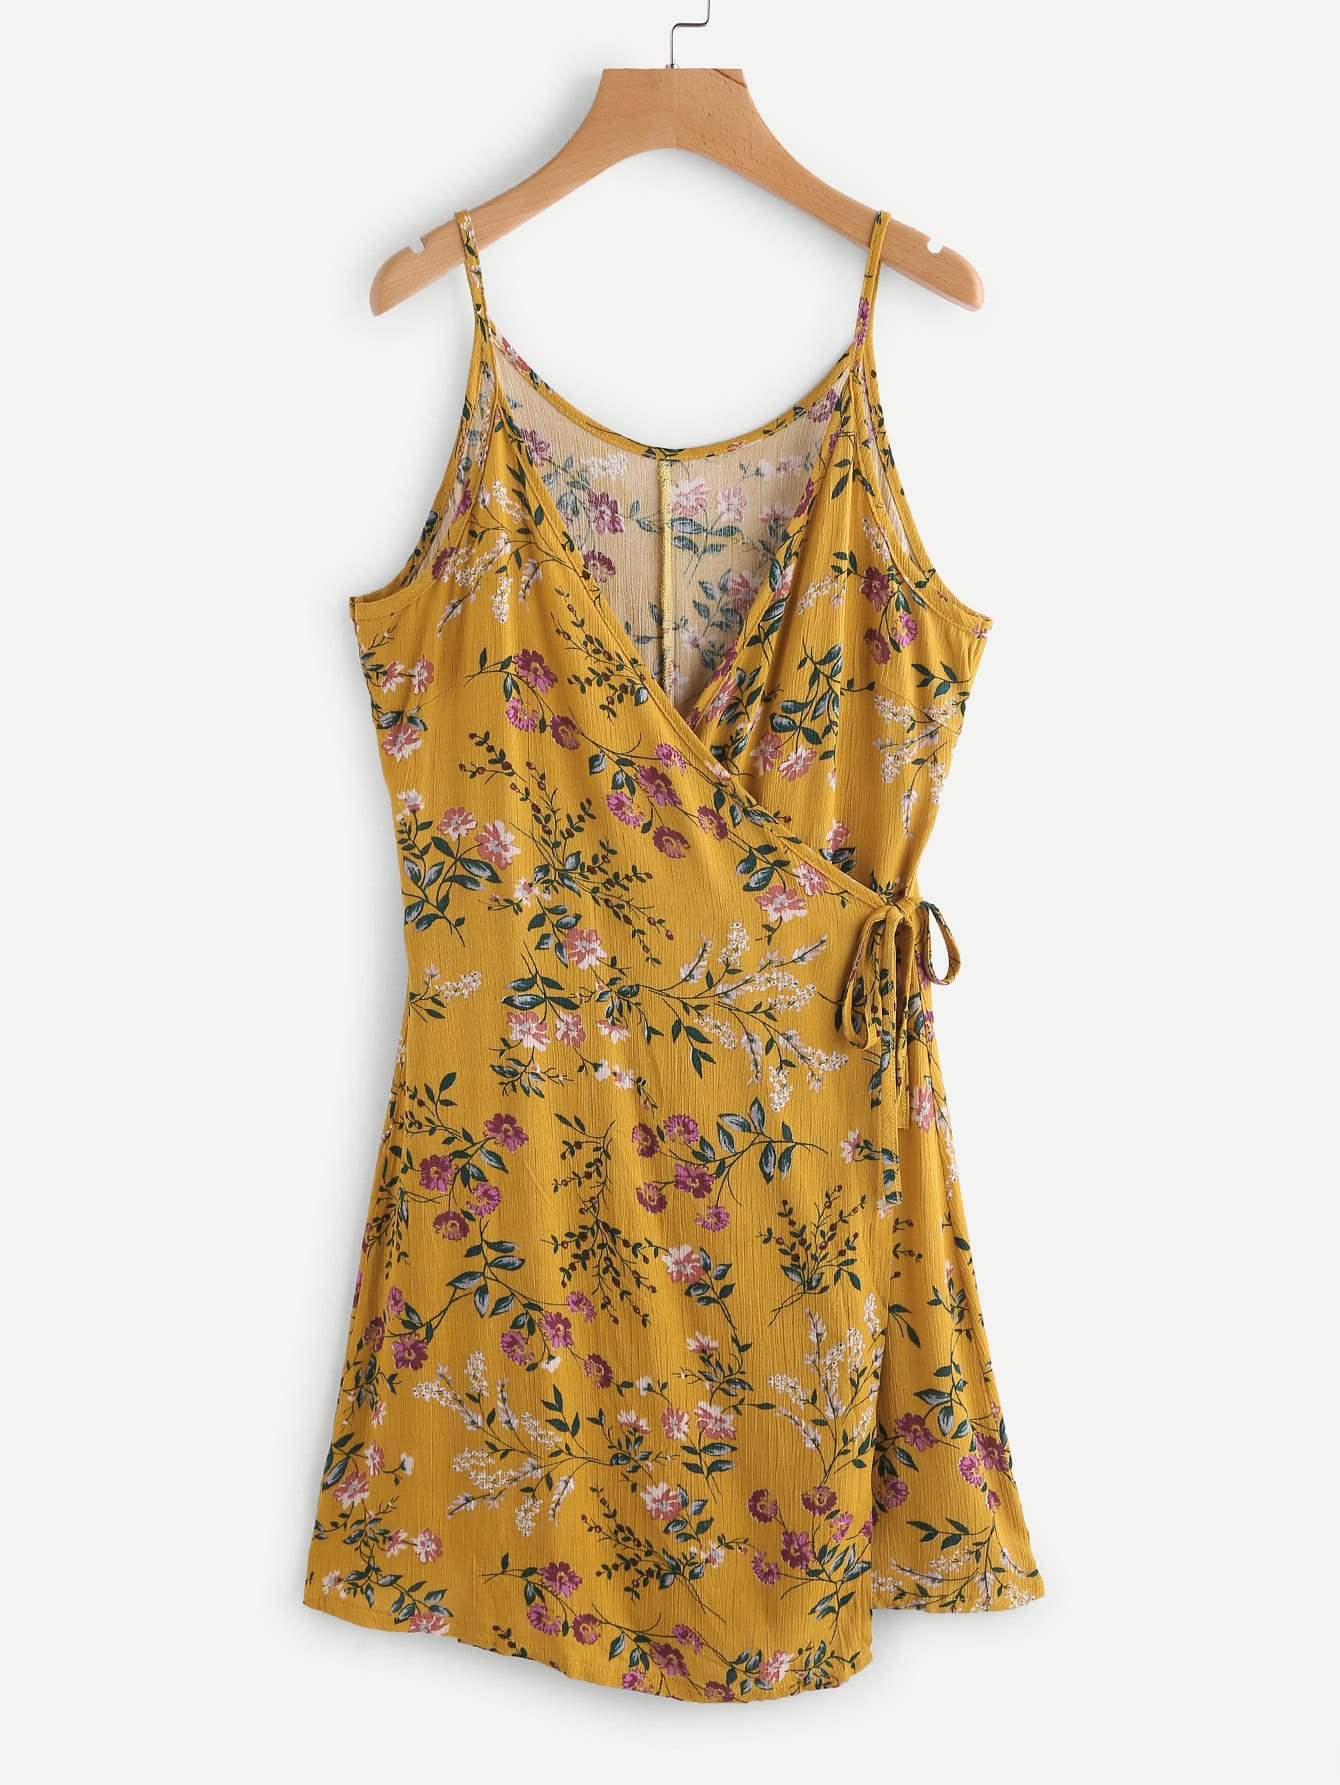 Floral Print Random Wrap Self Tie Cami Dress random floral print two piece self tie design tank swimsuit